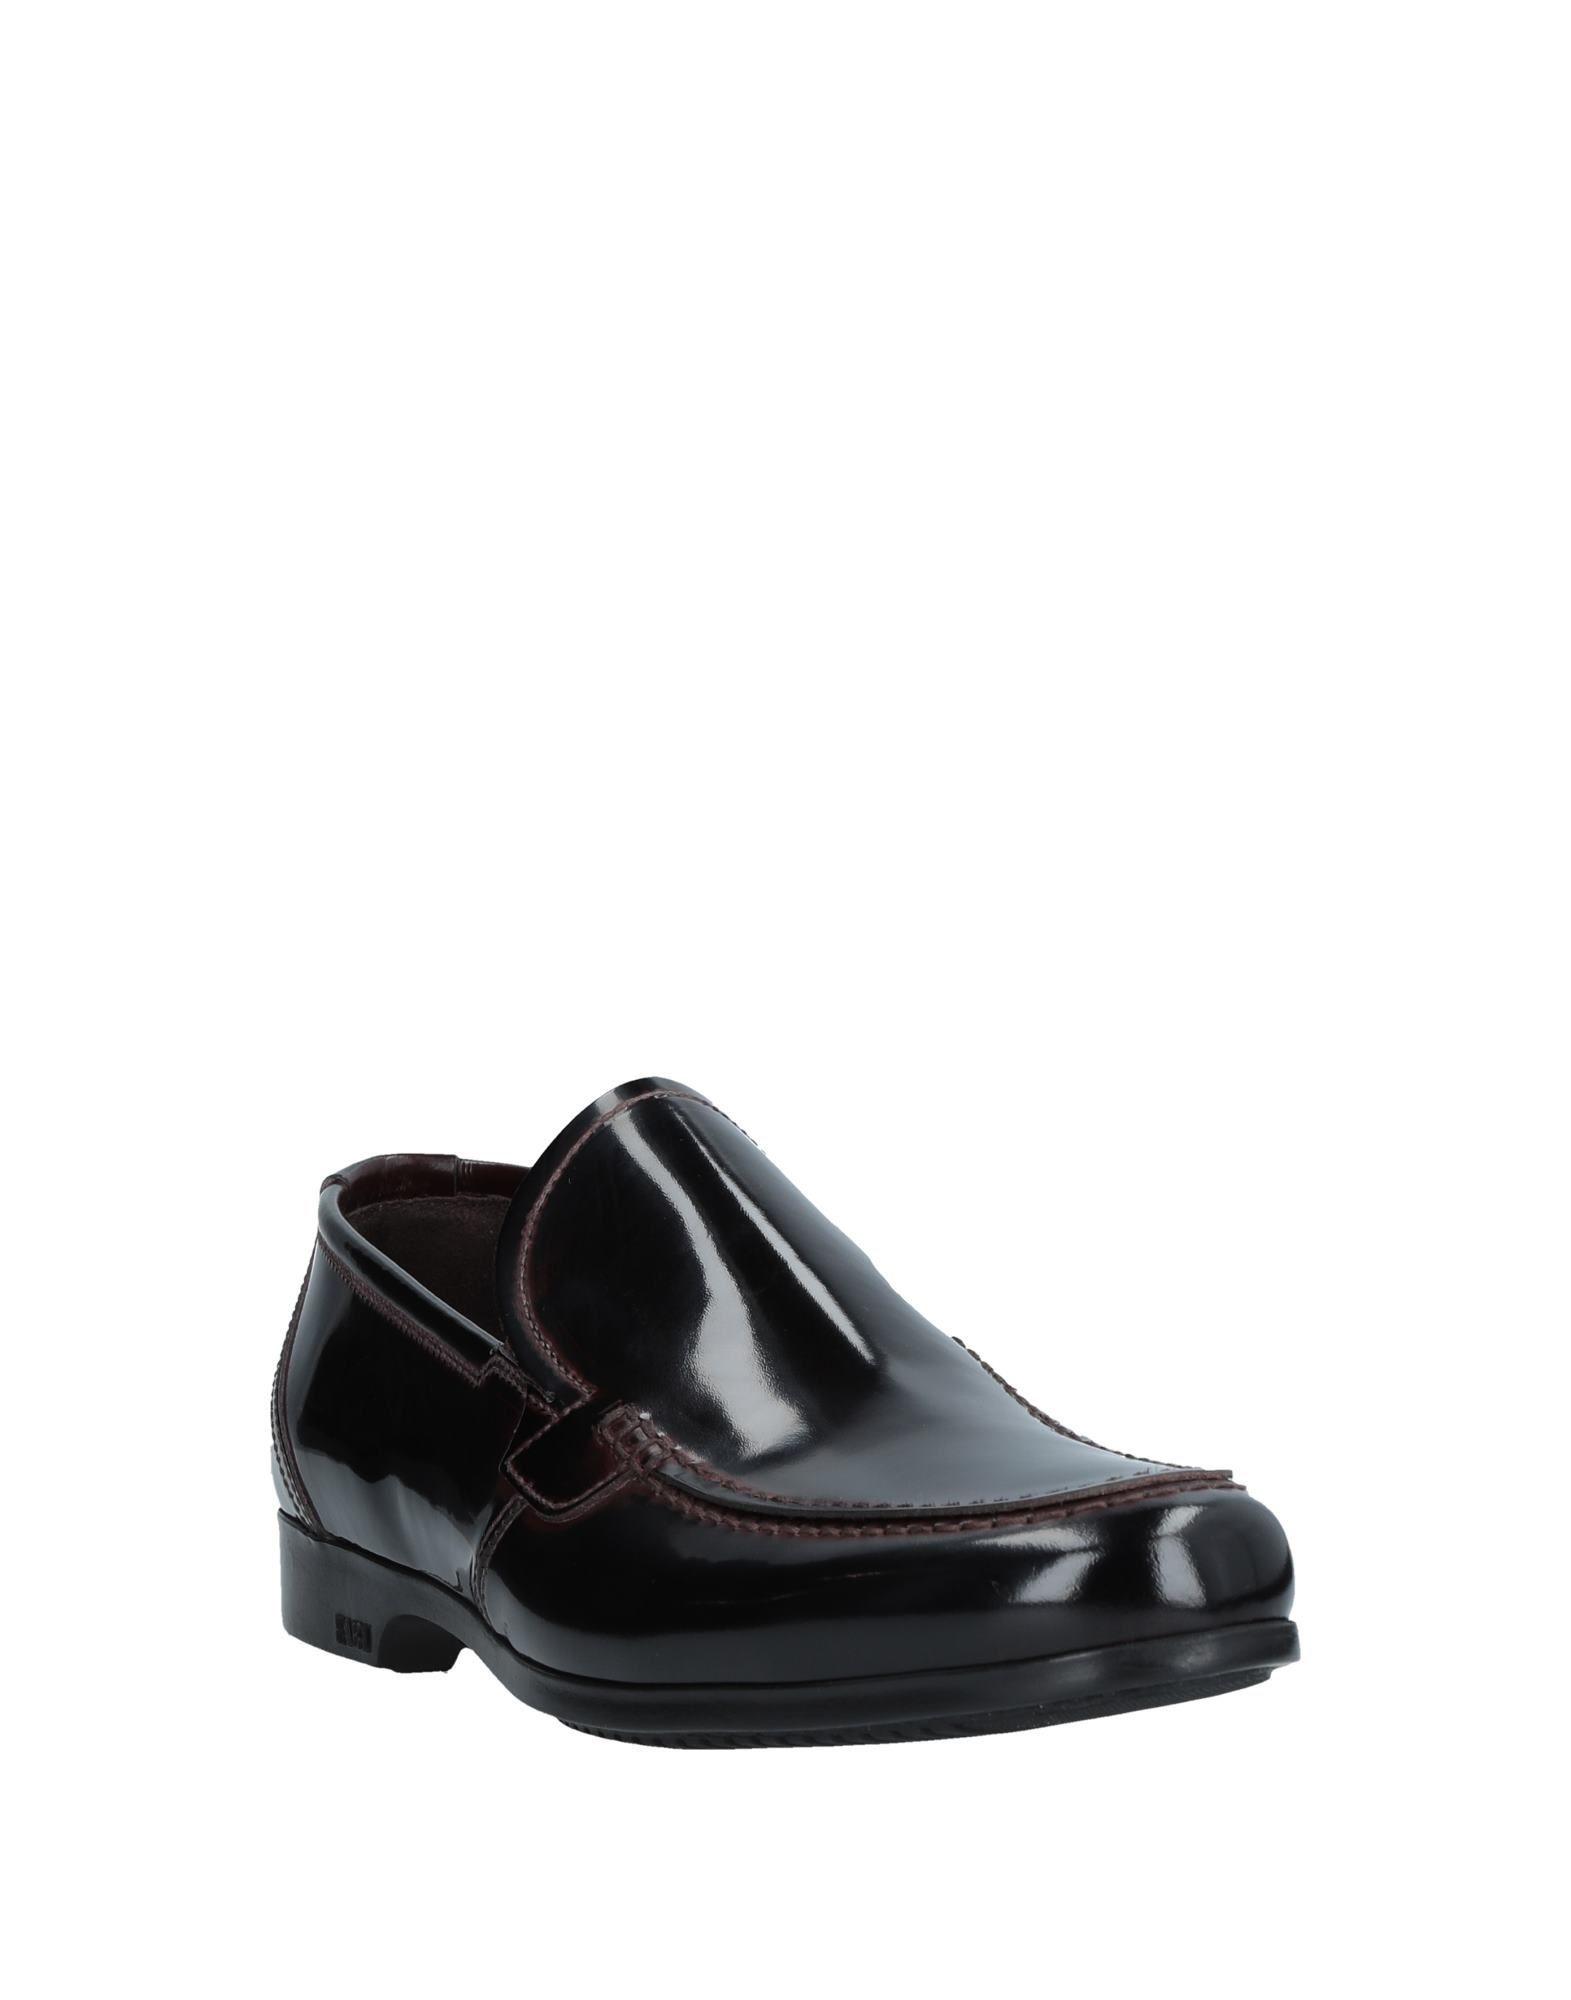 FOOTWEAR Fabi Dark brown Man Leather